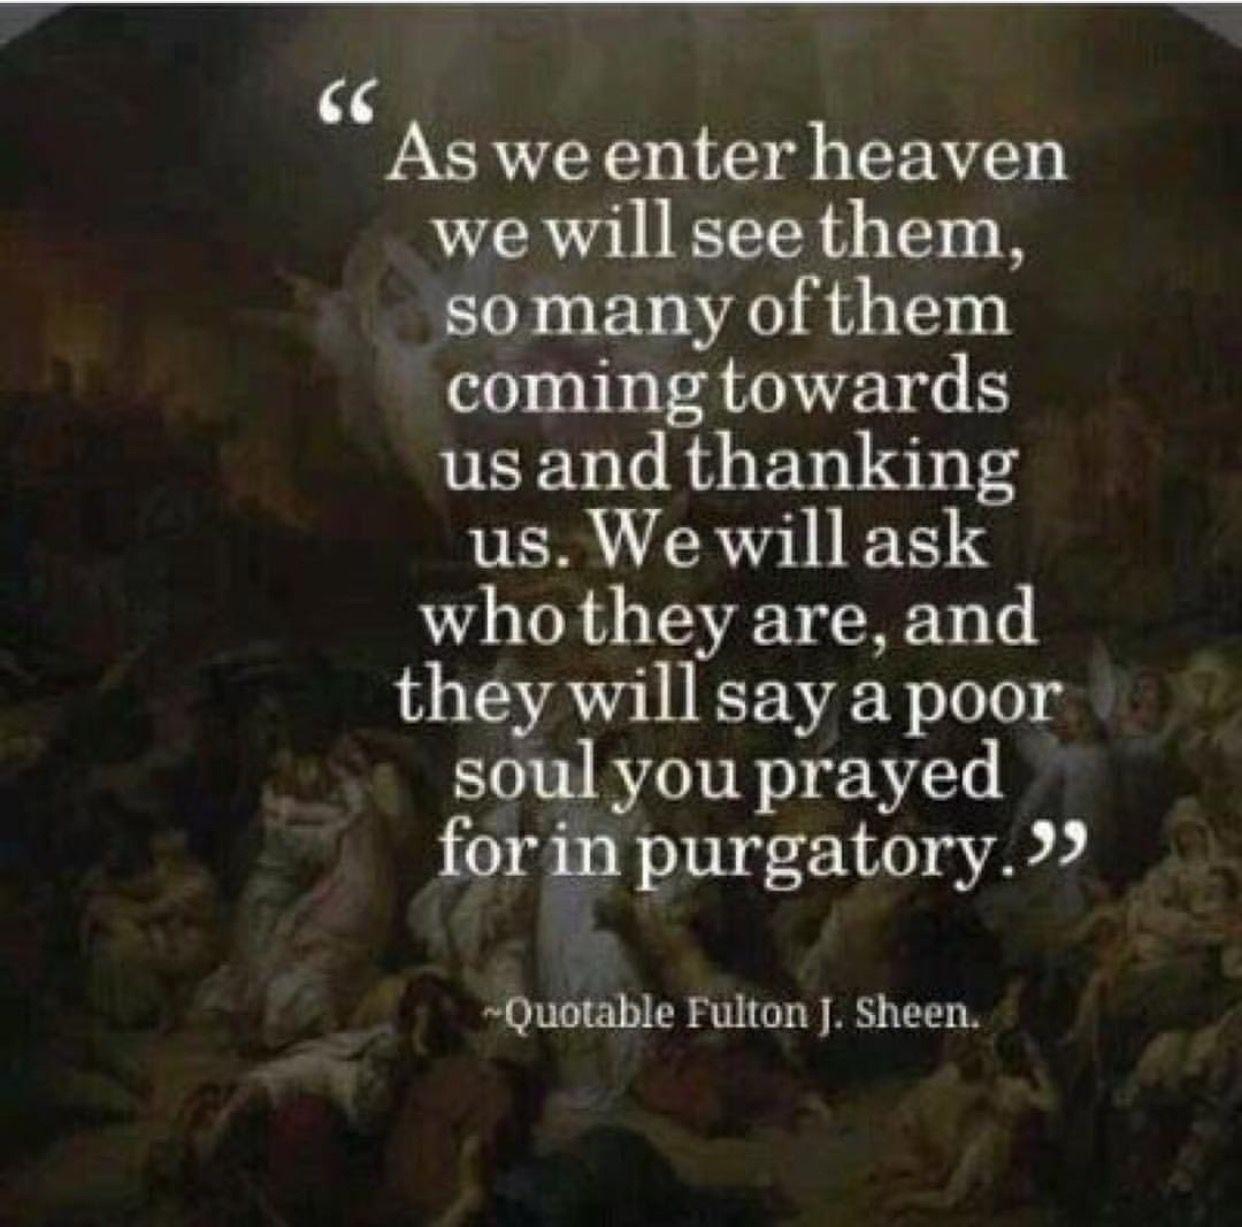 ...soul you prayed for in purgatory. Fulton J. Sheen